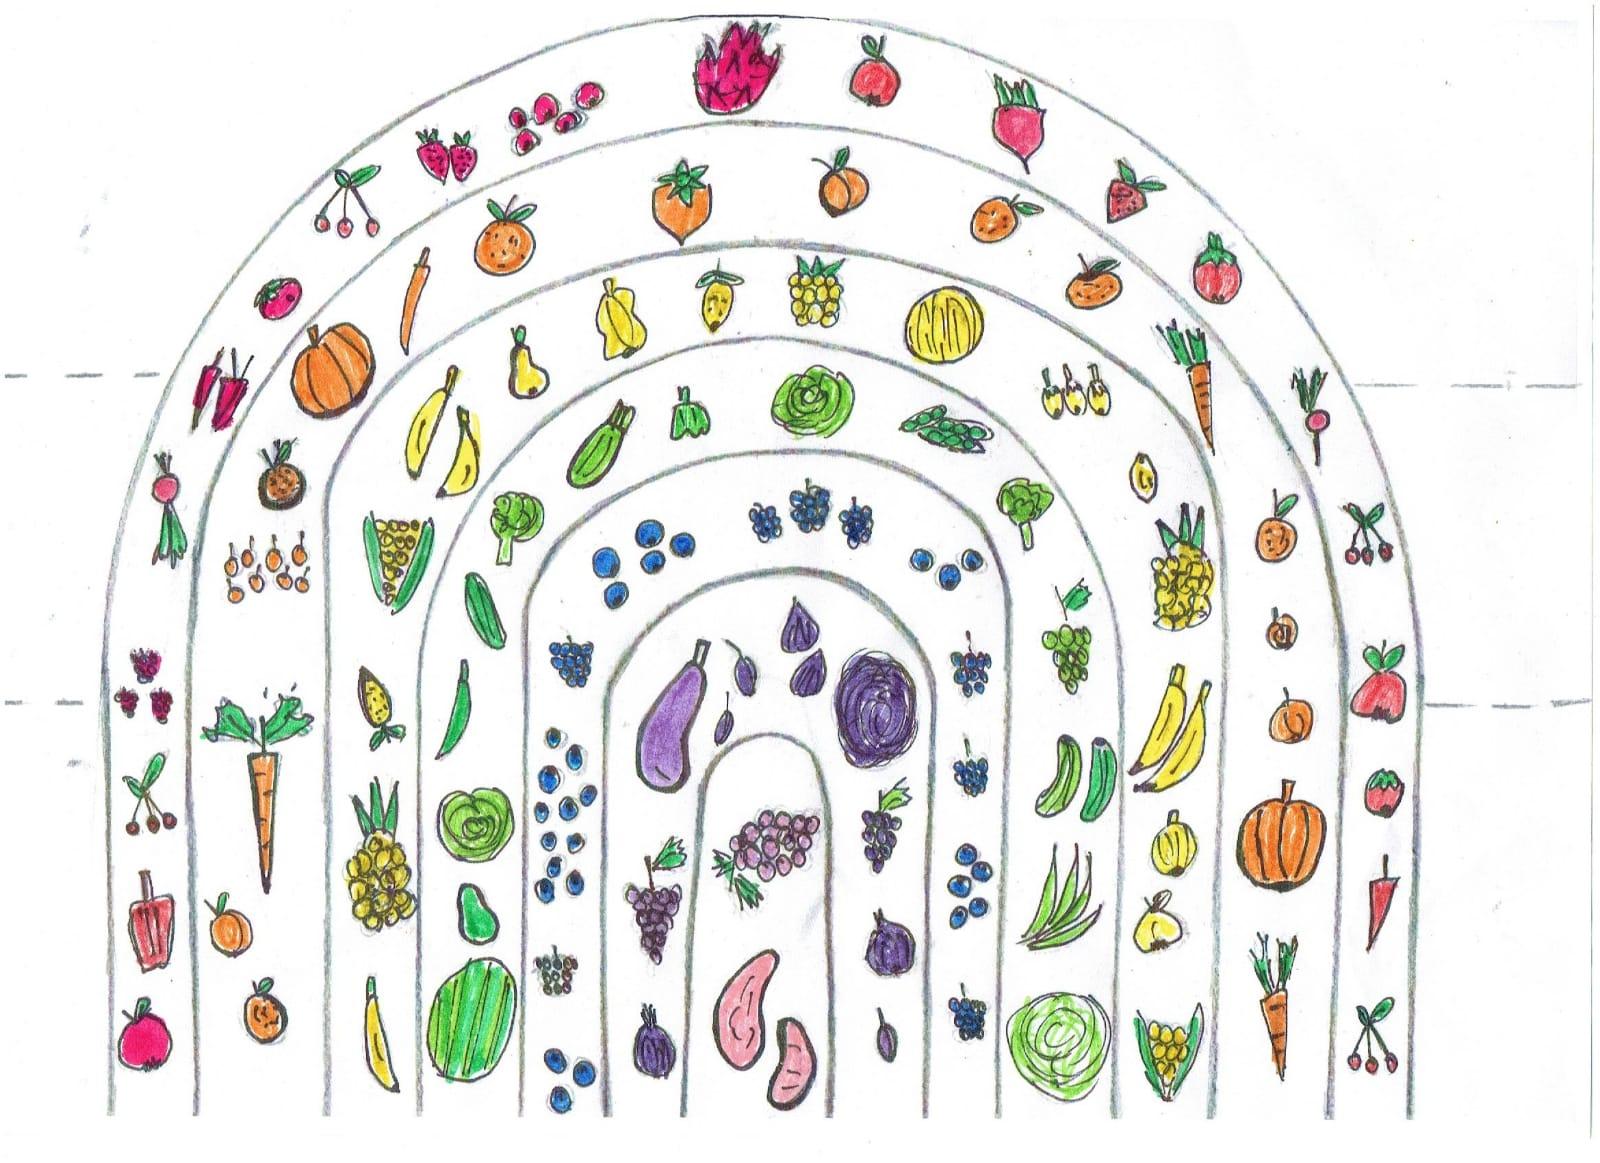 curcubeu din legume si fructe